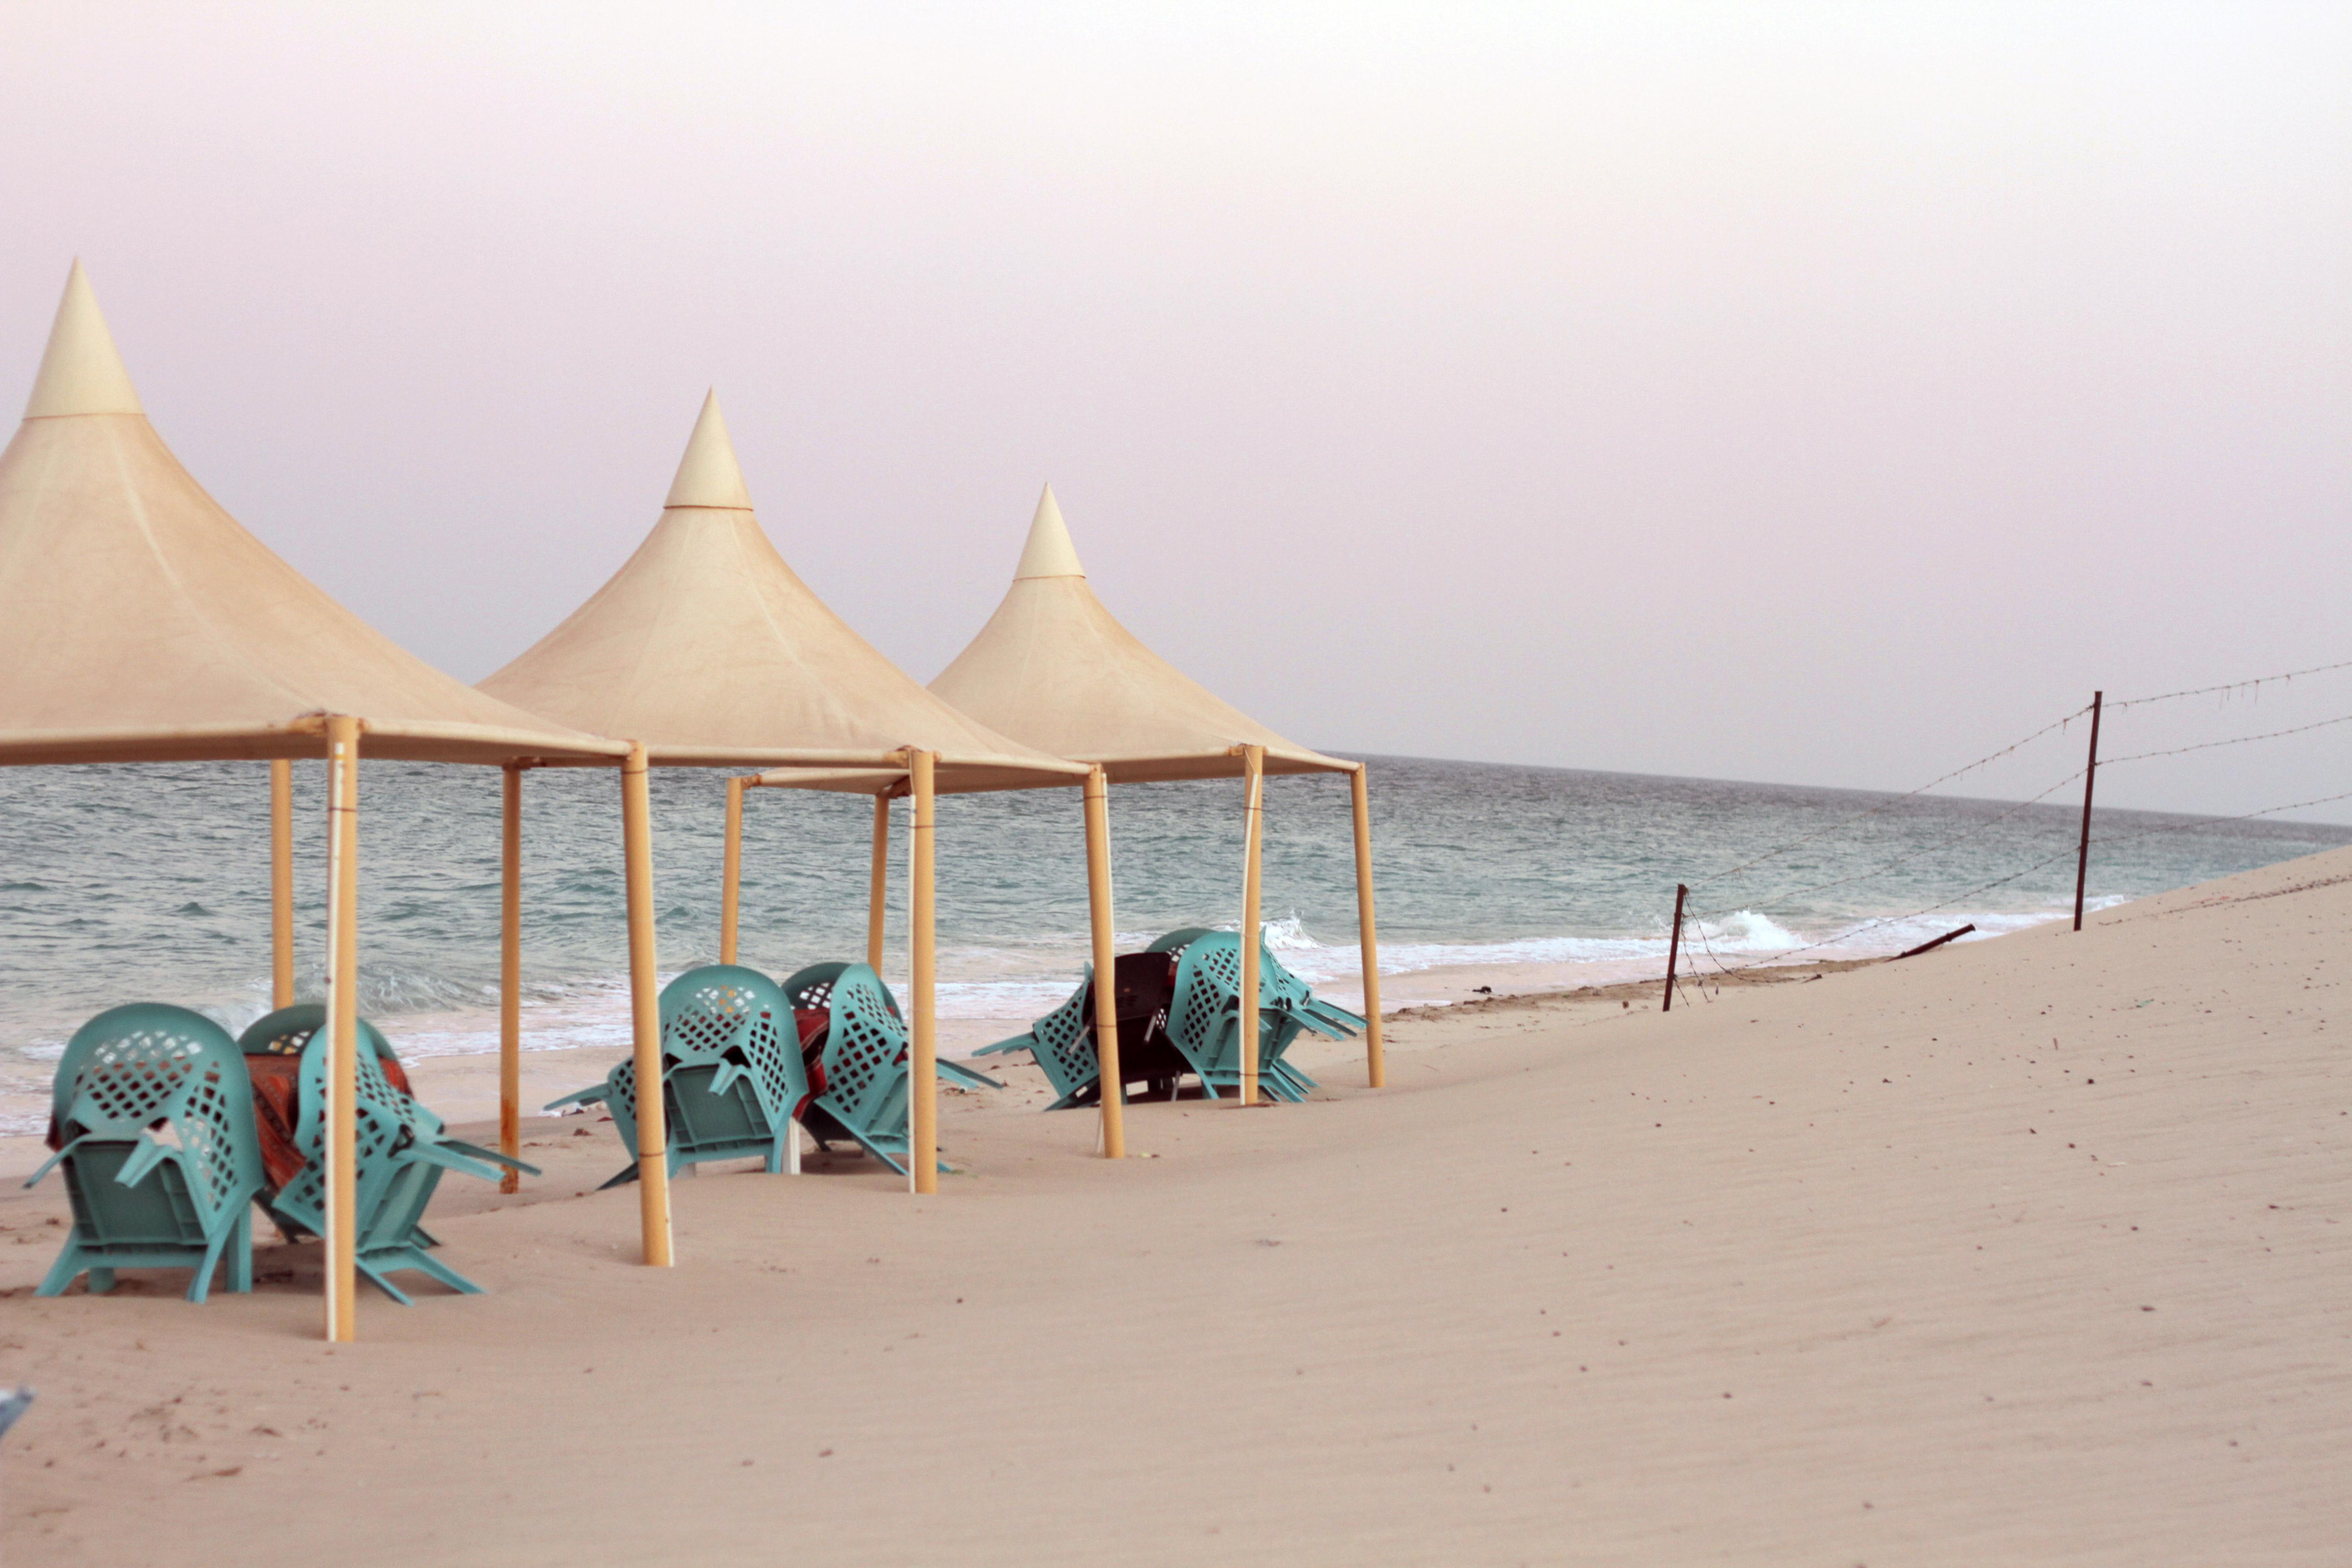 camping in qatar desert